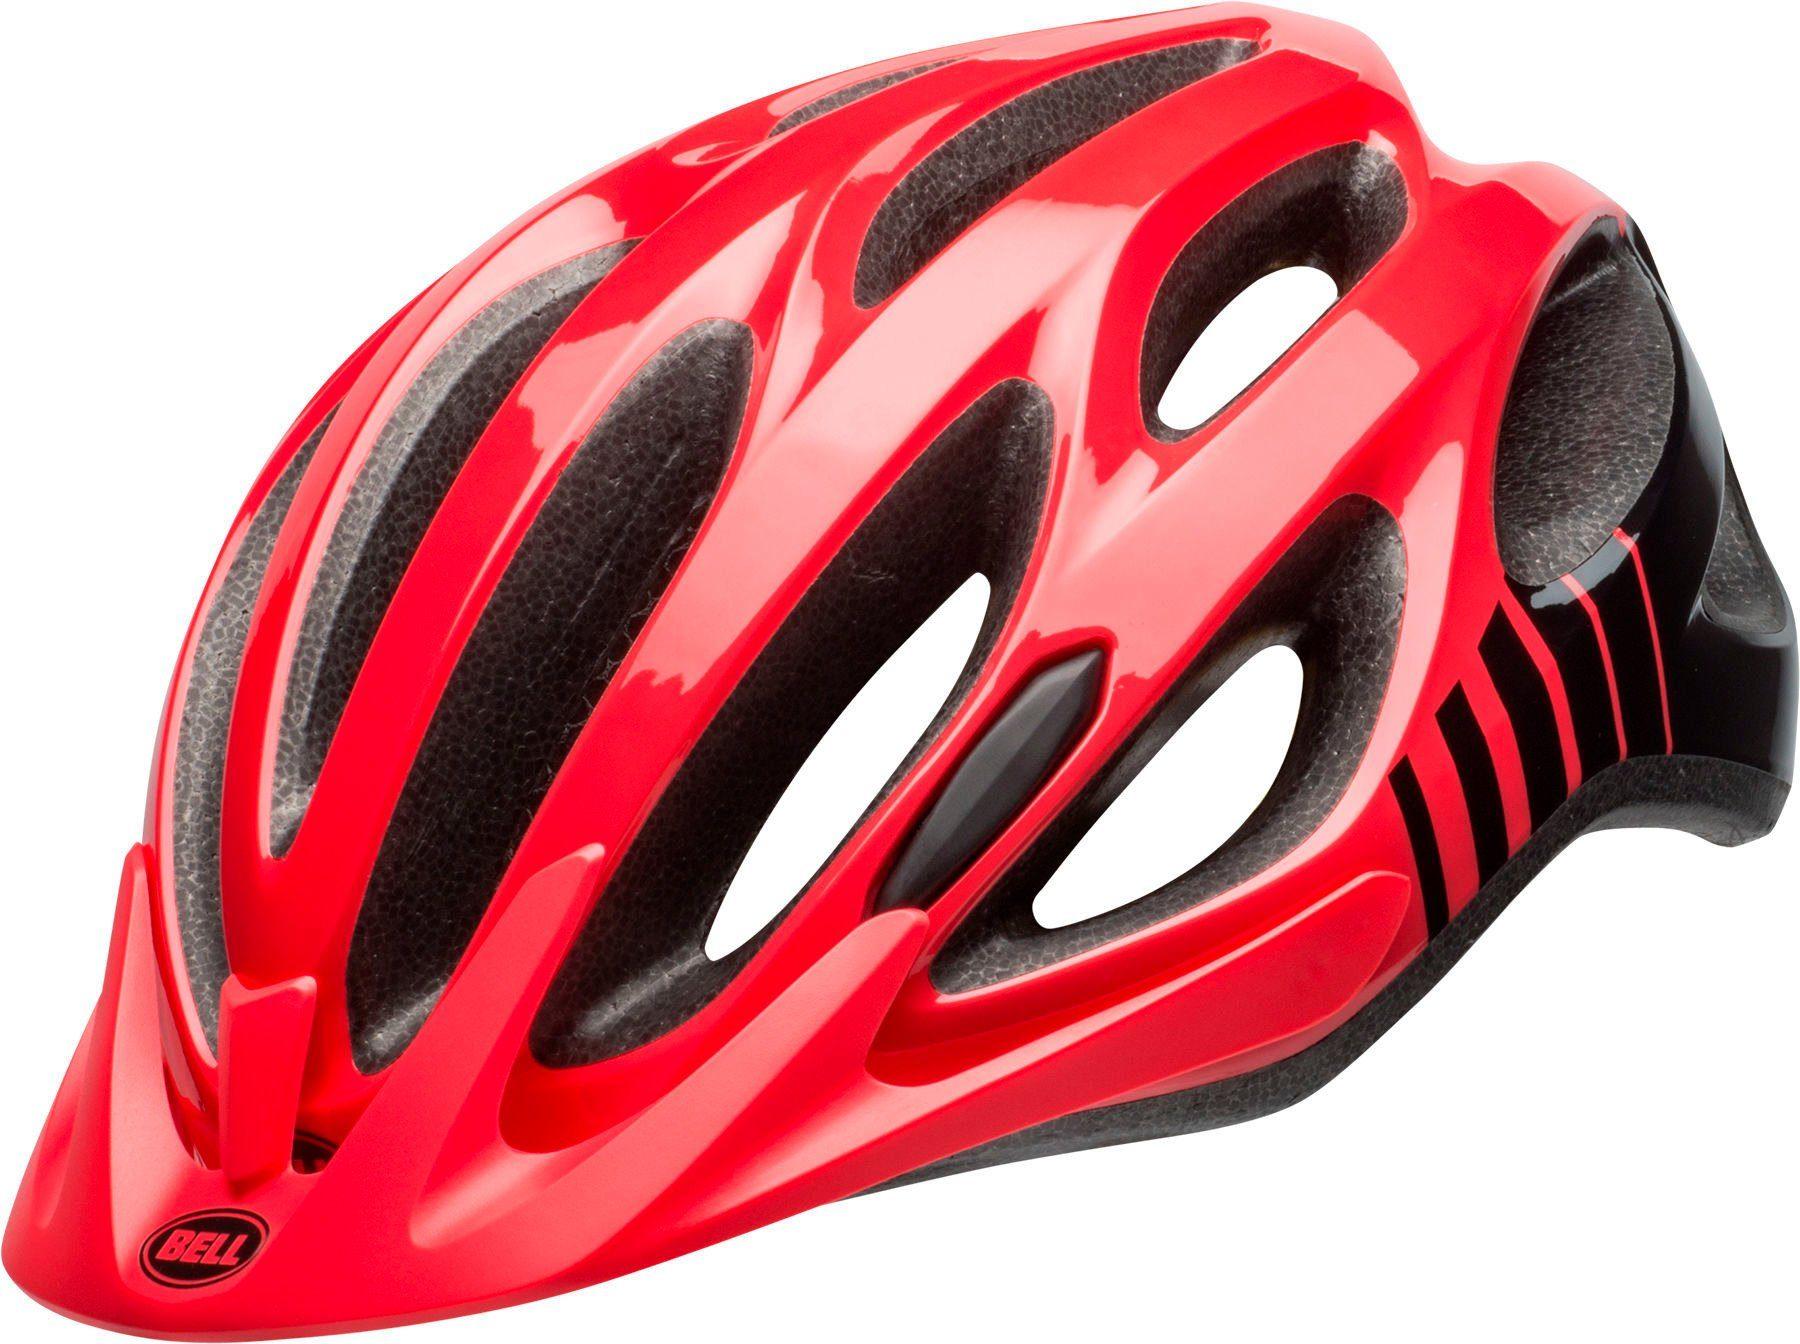 Bell Fahrradhelm »Traverse Lifestyle Helmet«